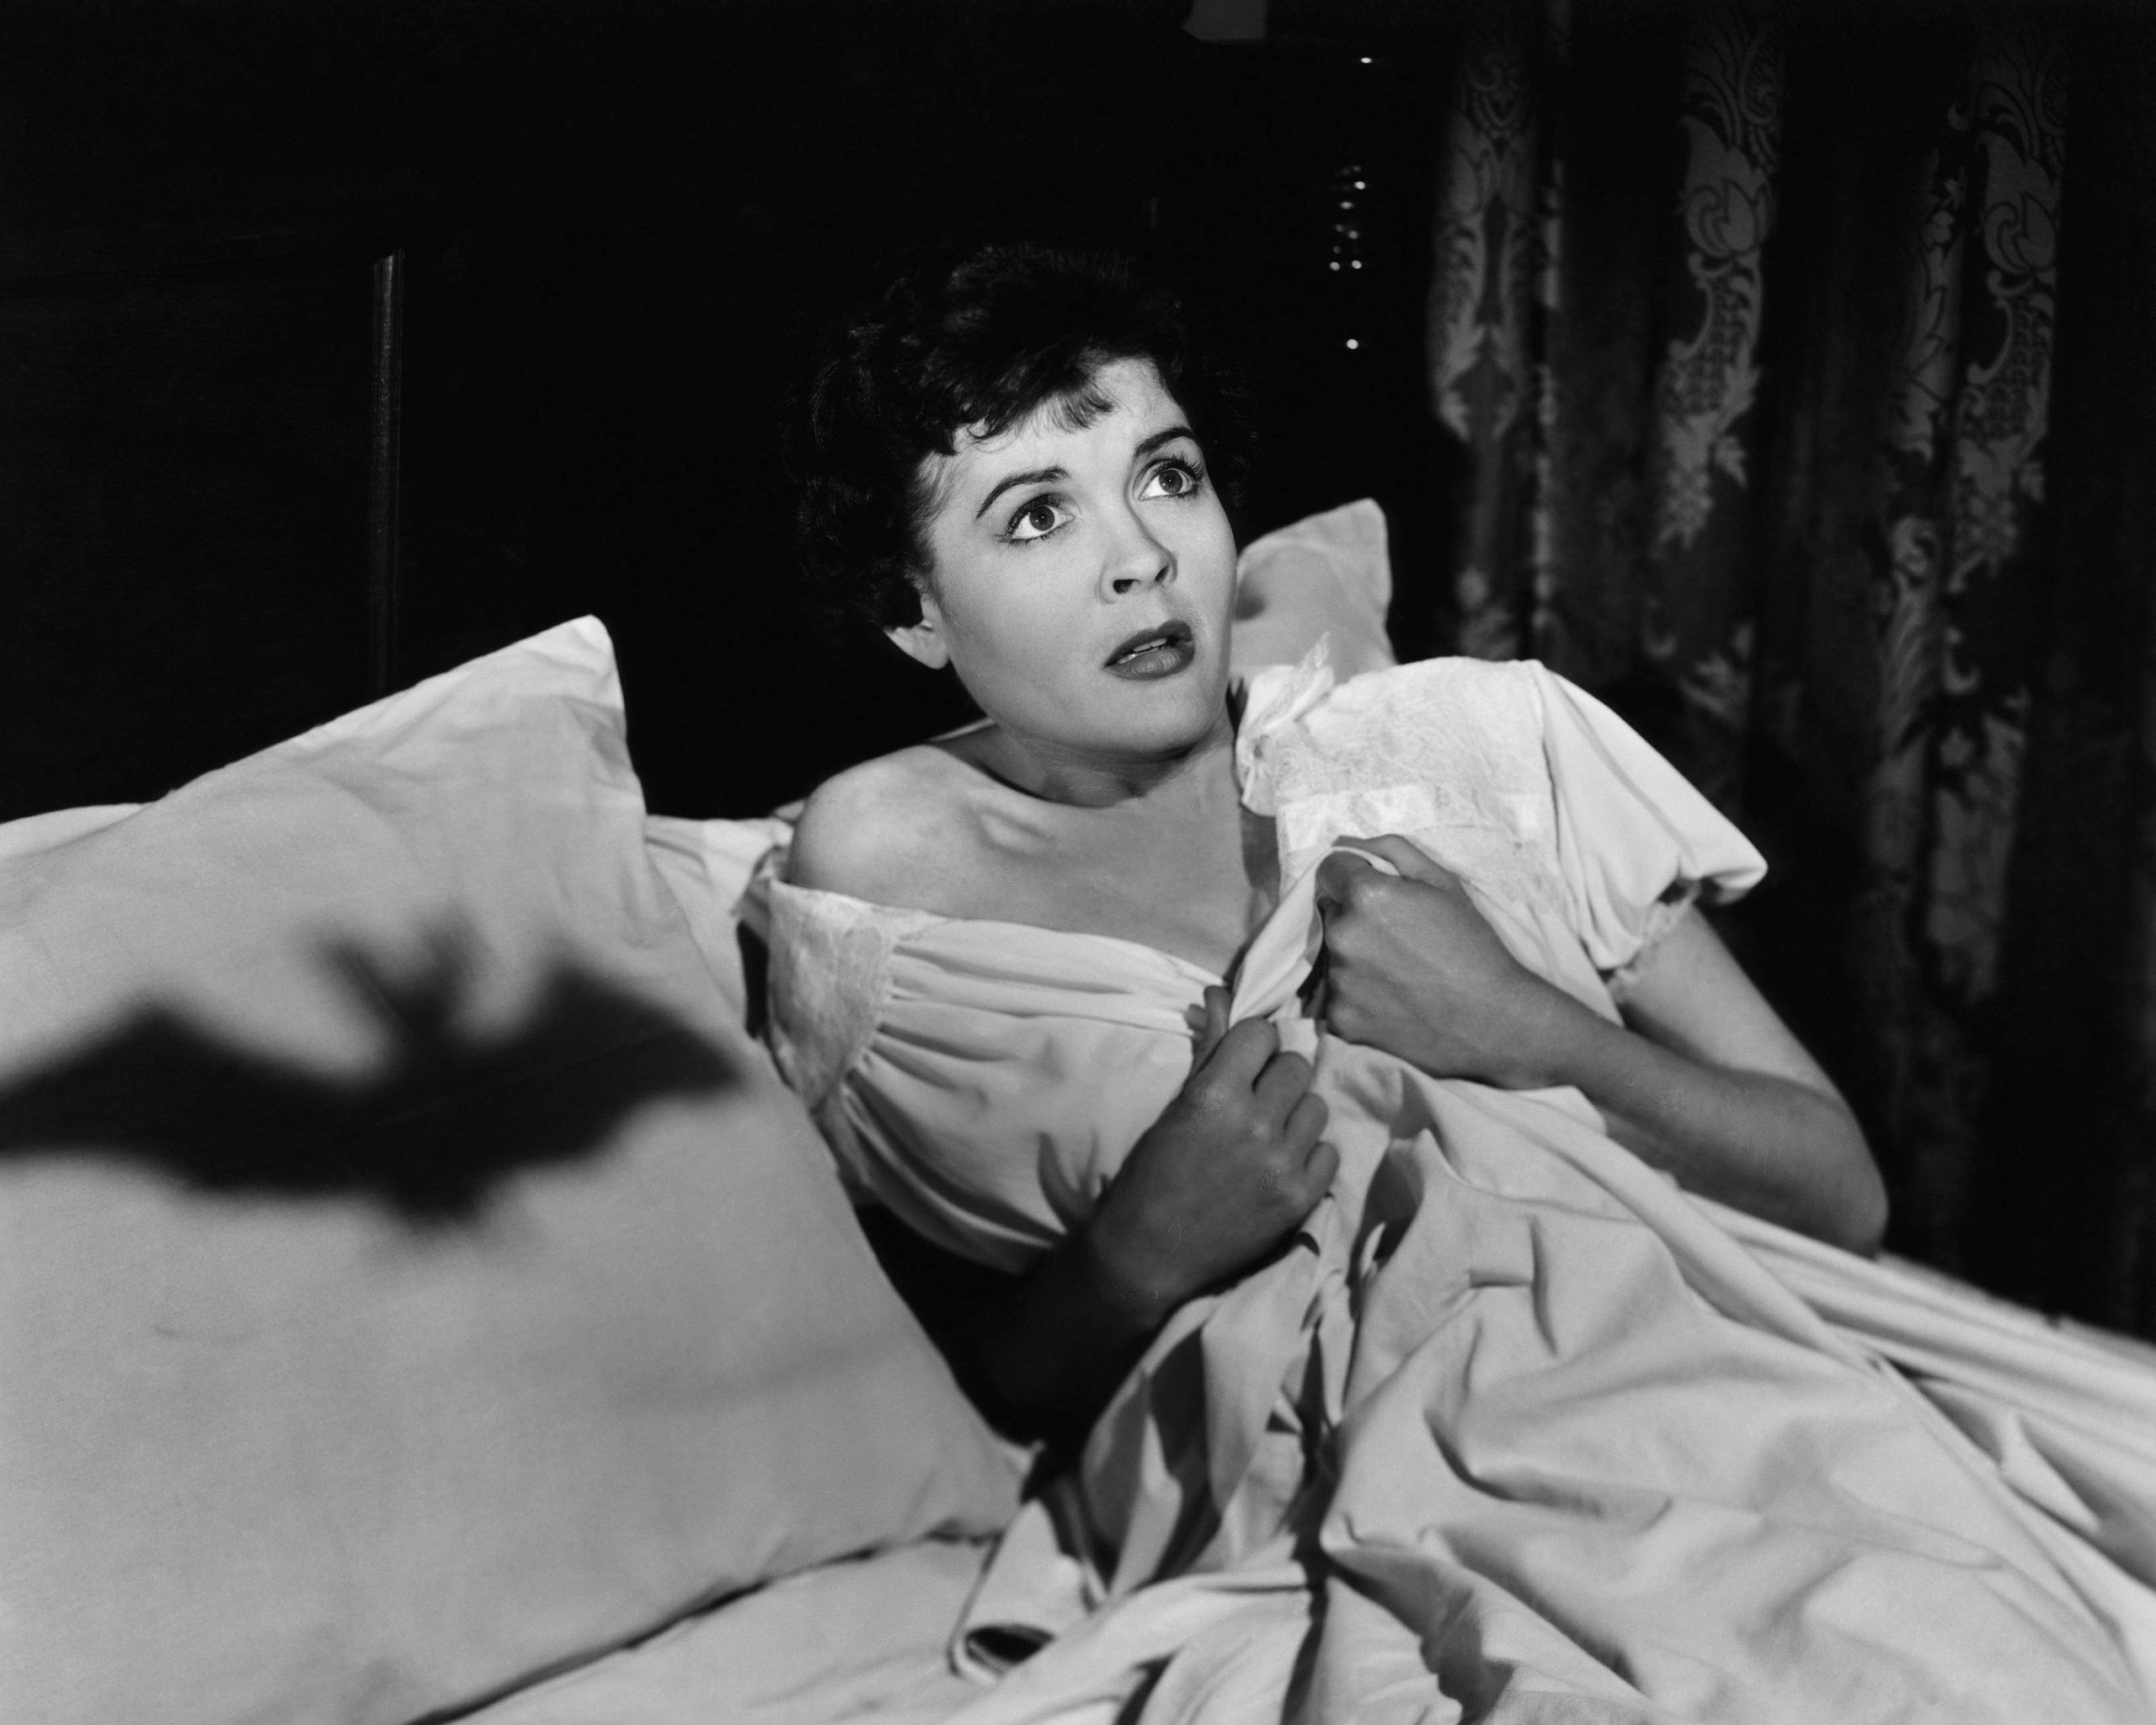 darla-hood-in-1959s-the-bat